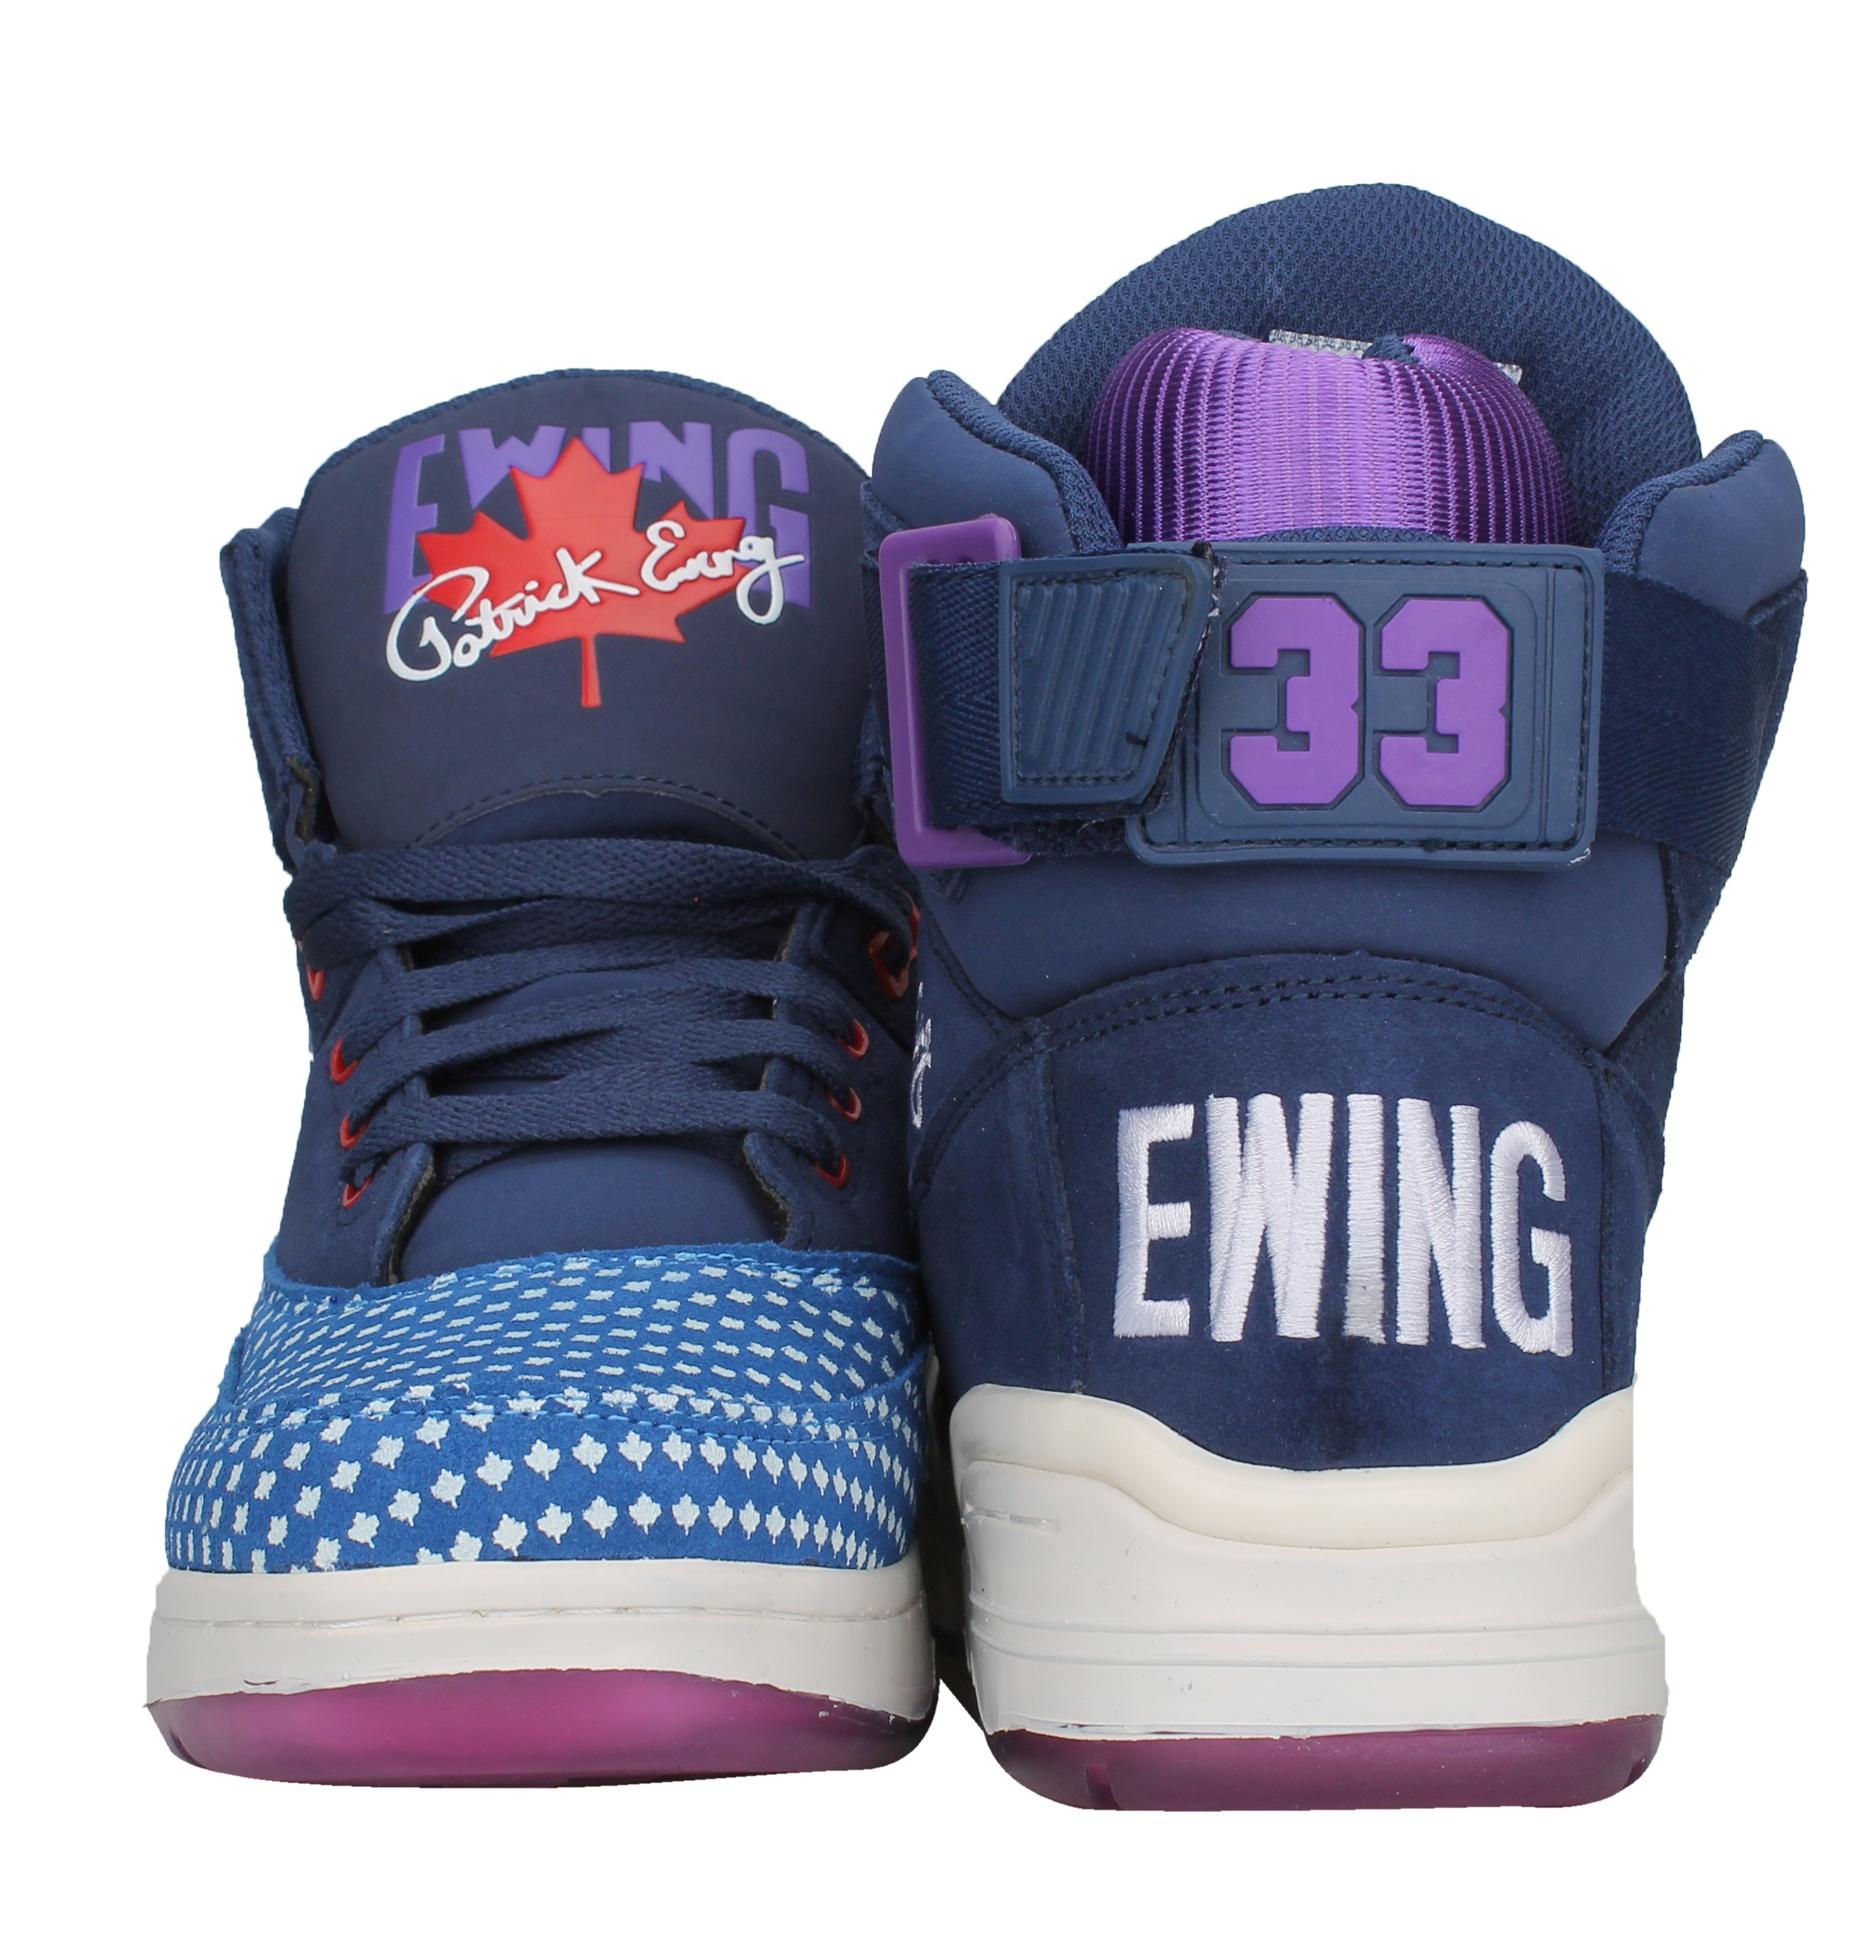 Ewing Athletics Ewing 33 Hi 2016 All Star Men's Basketball Shoes 1EW90166-463